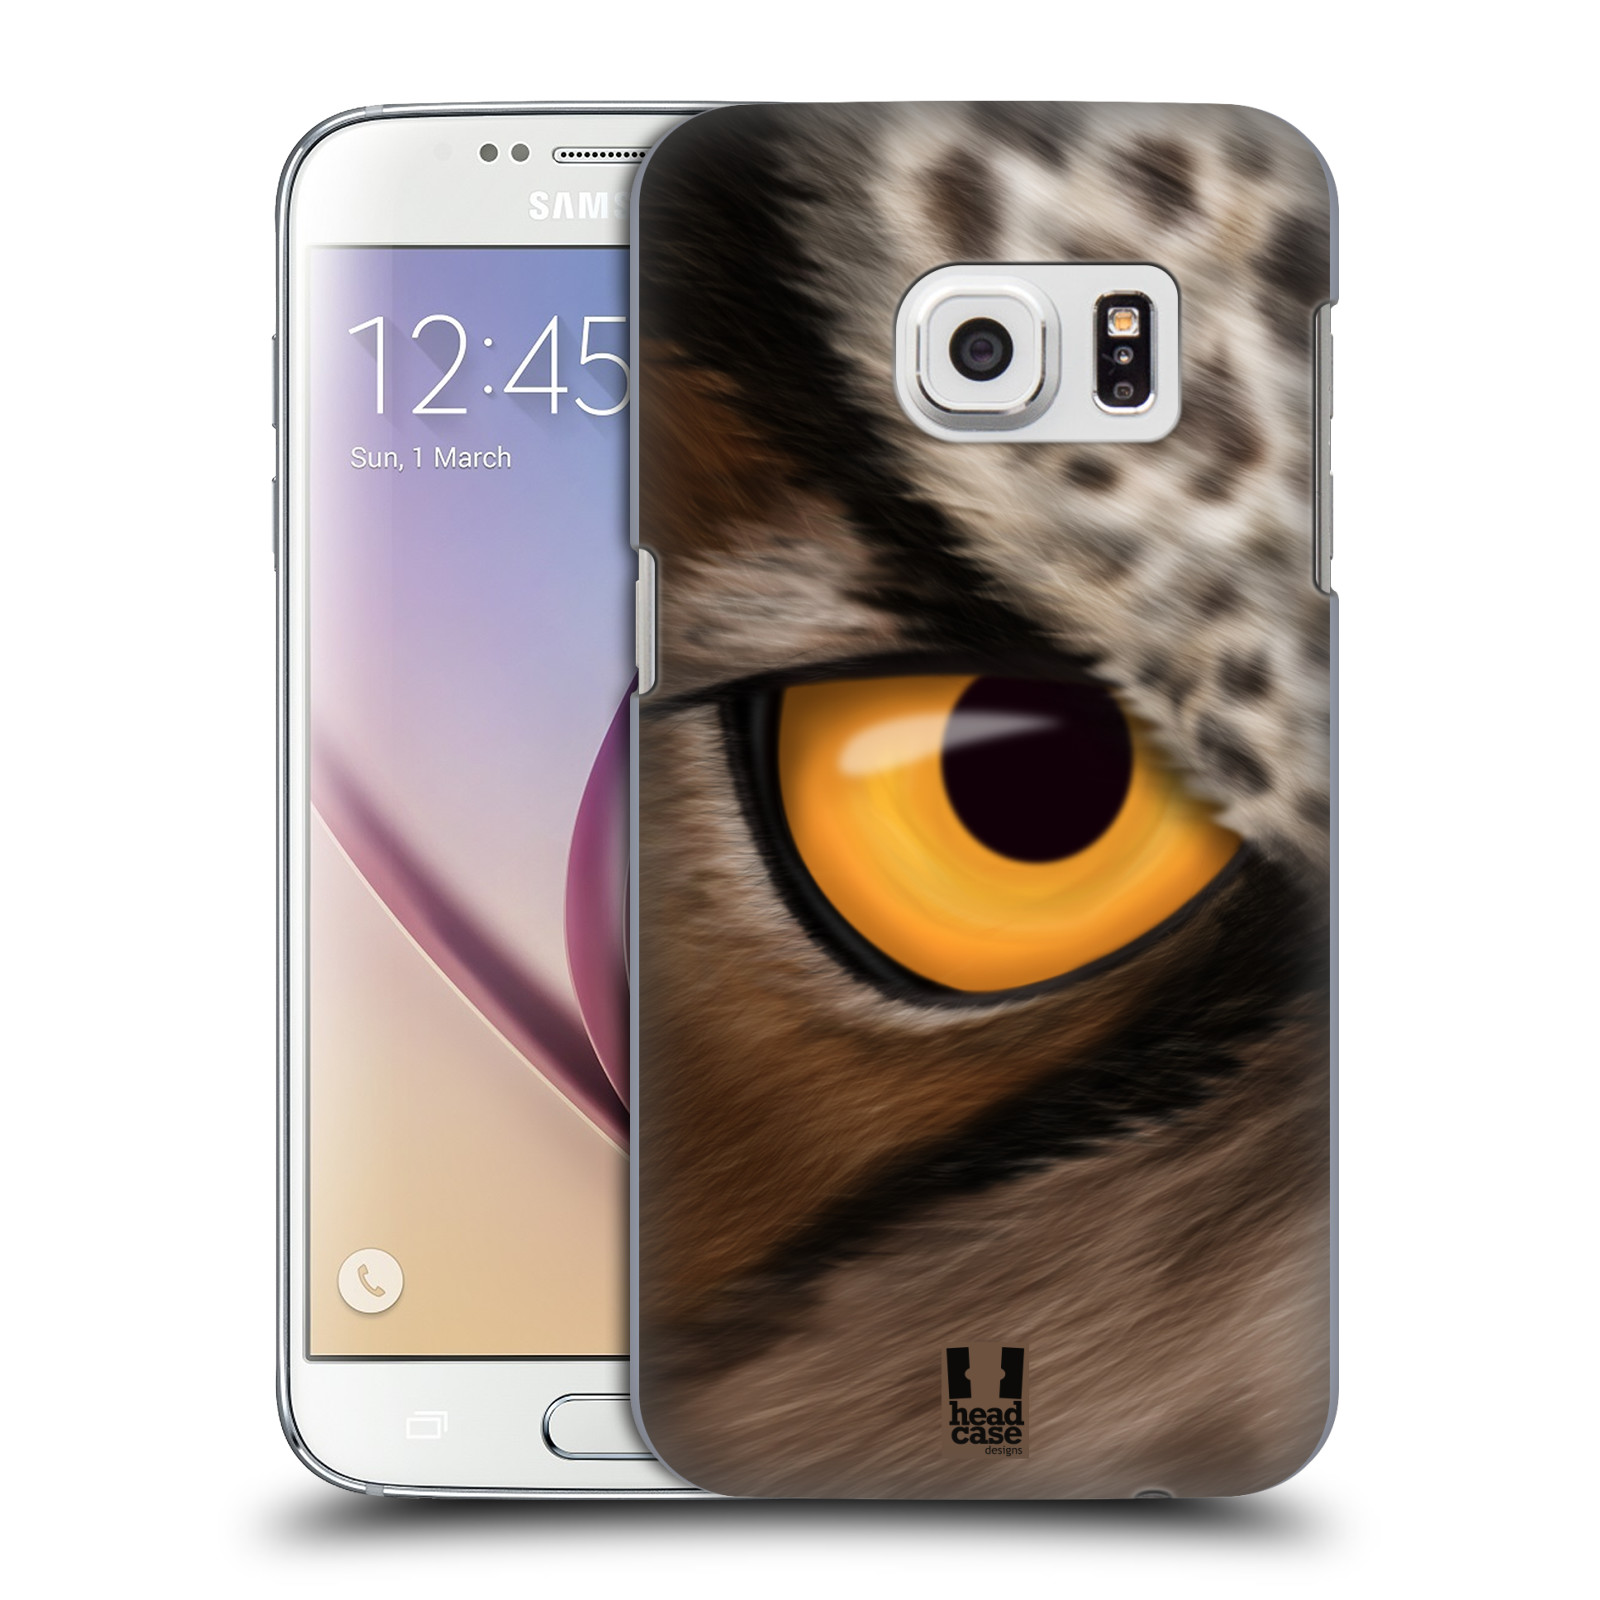 HEAD CASE plastový obal na mobil SAMSUNG GALAXY S7 vzor pohled zvířete oko sova